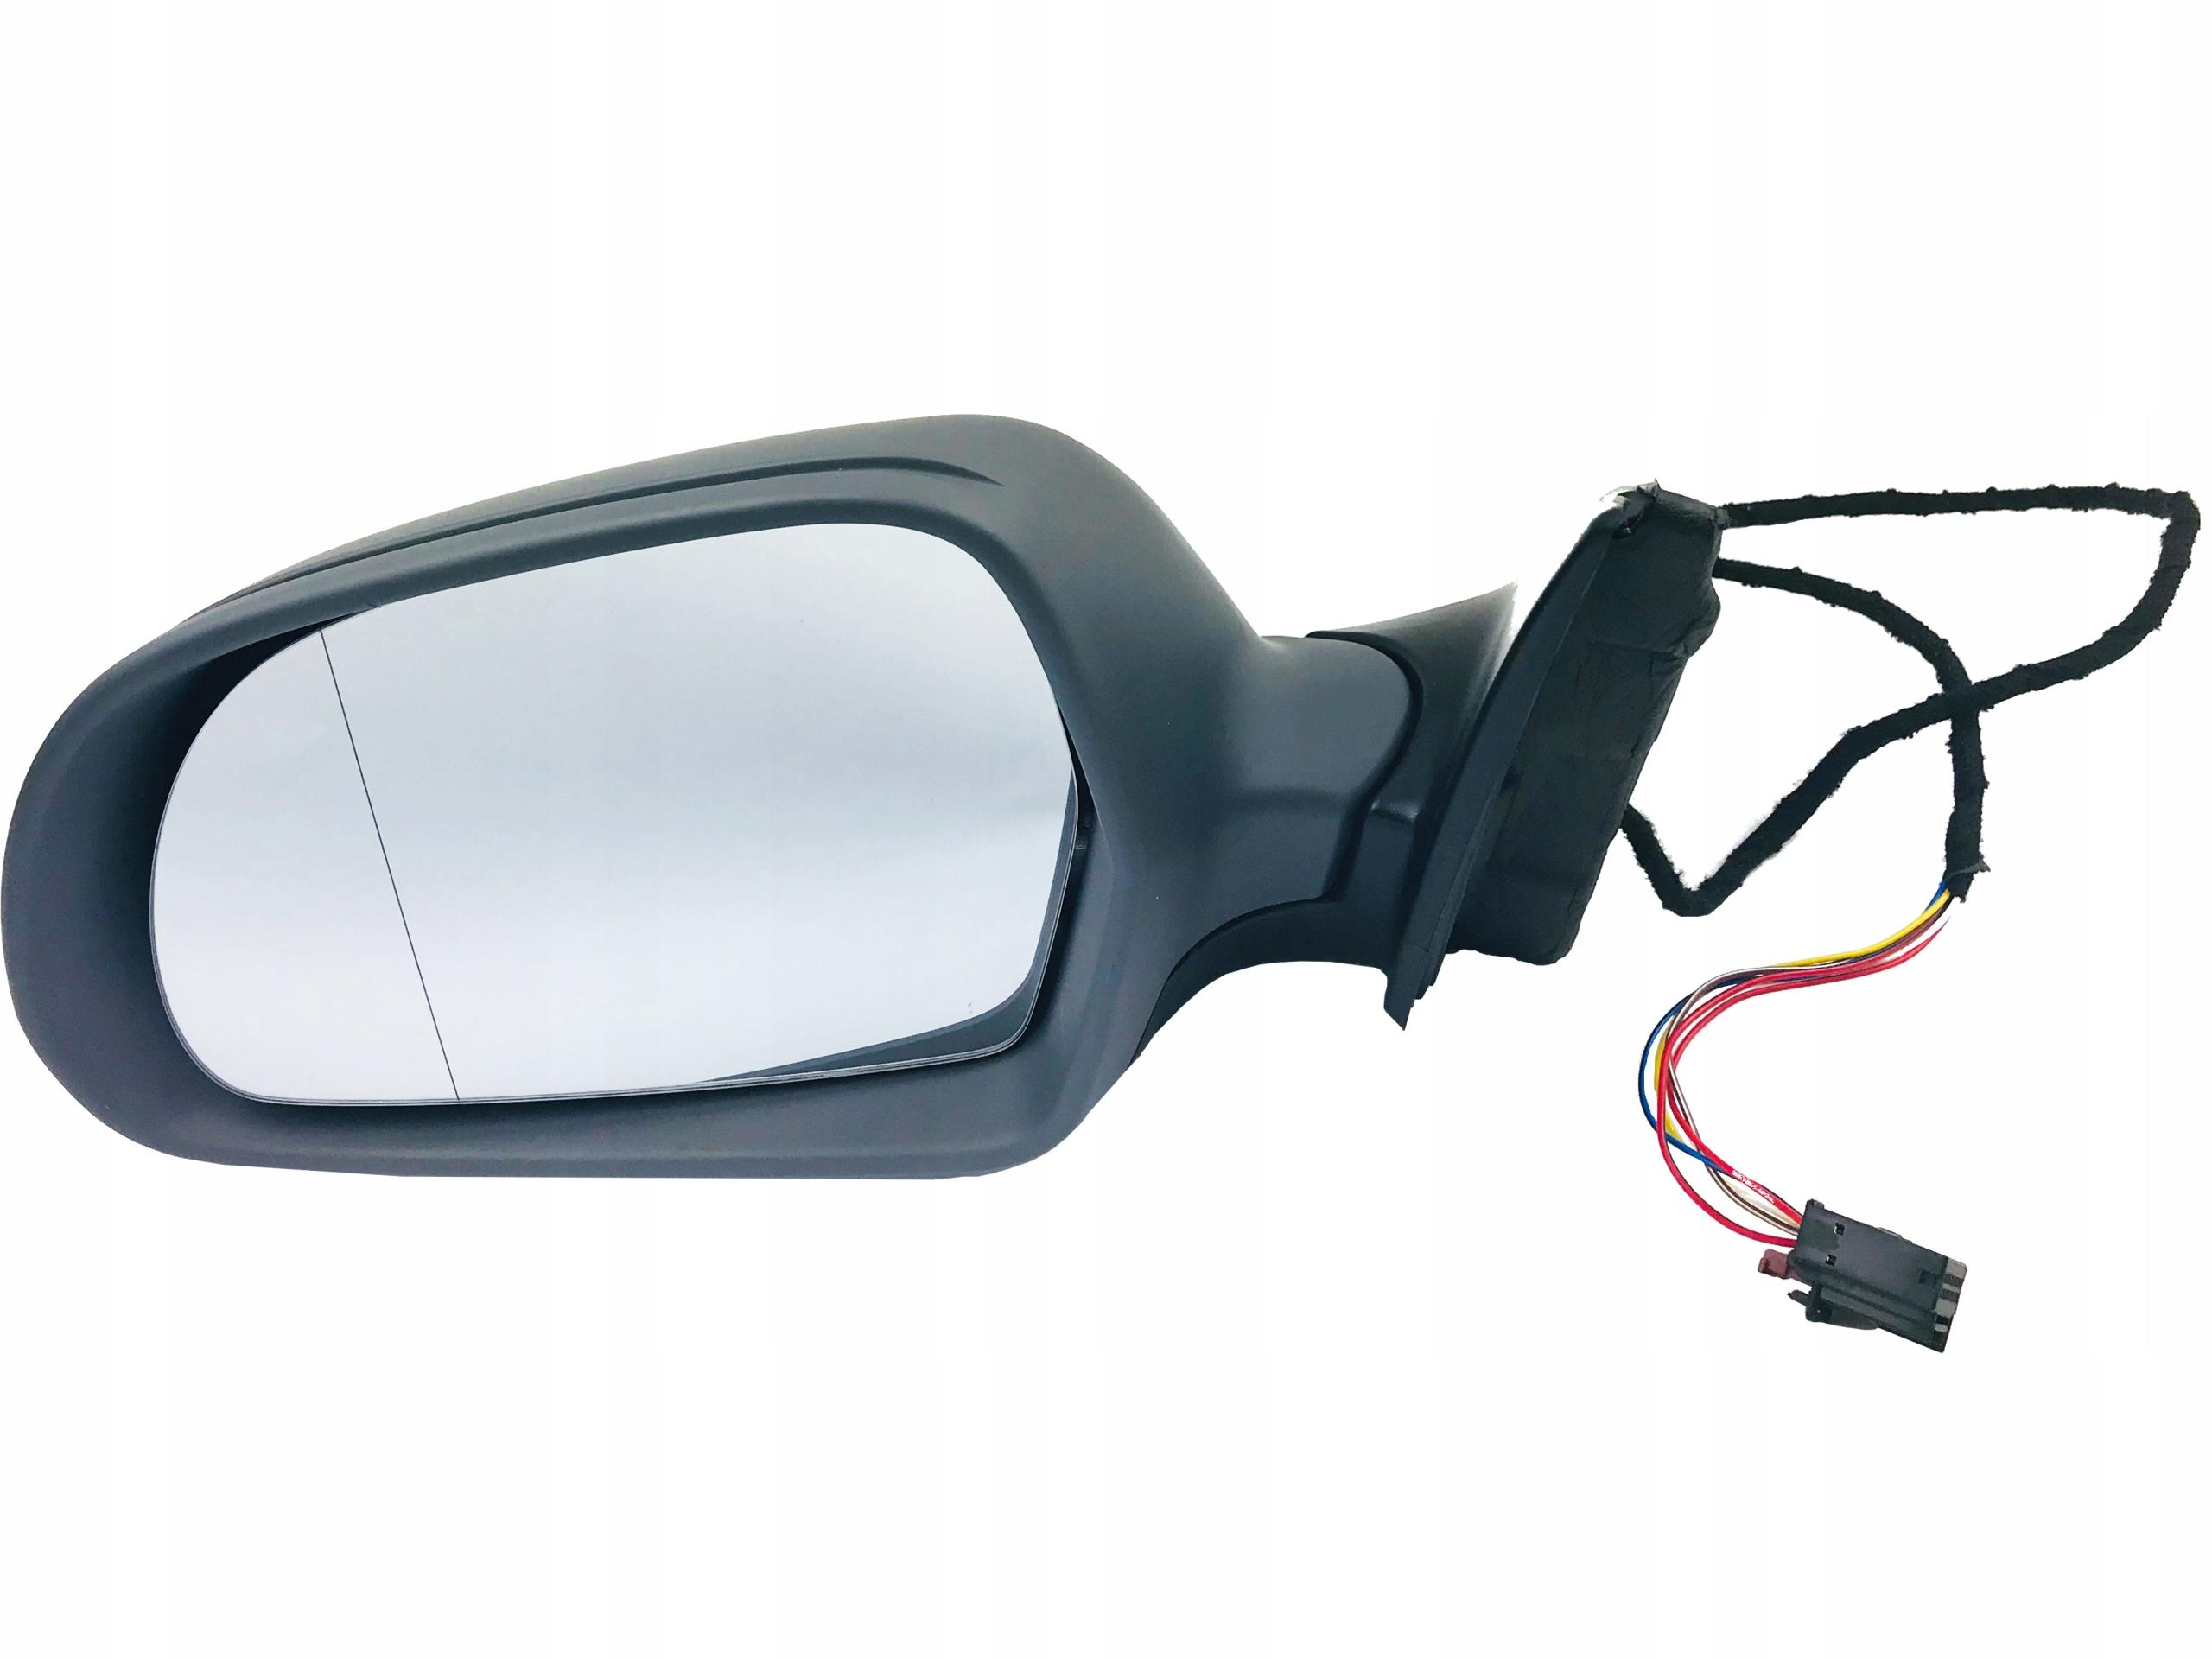 зеркало левое поворотник стекло skoda superb ii 2 левое